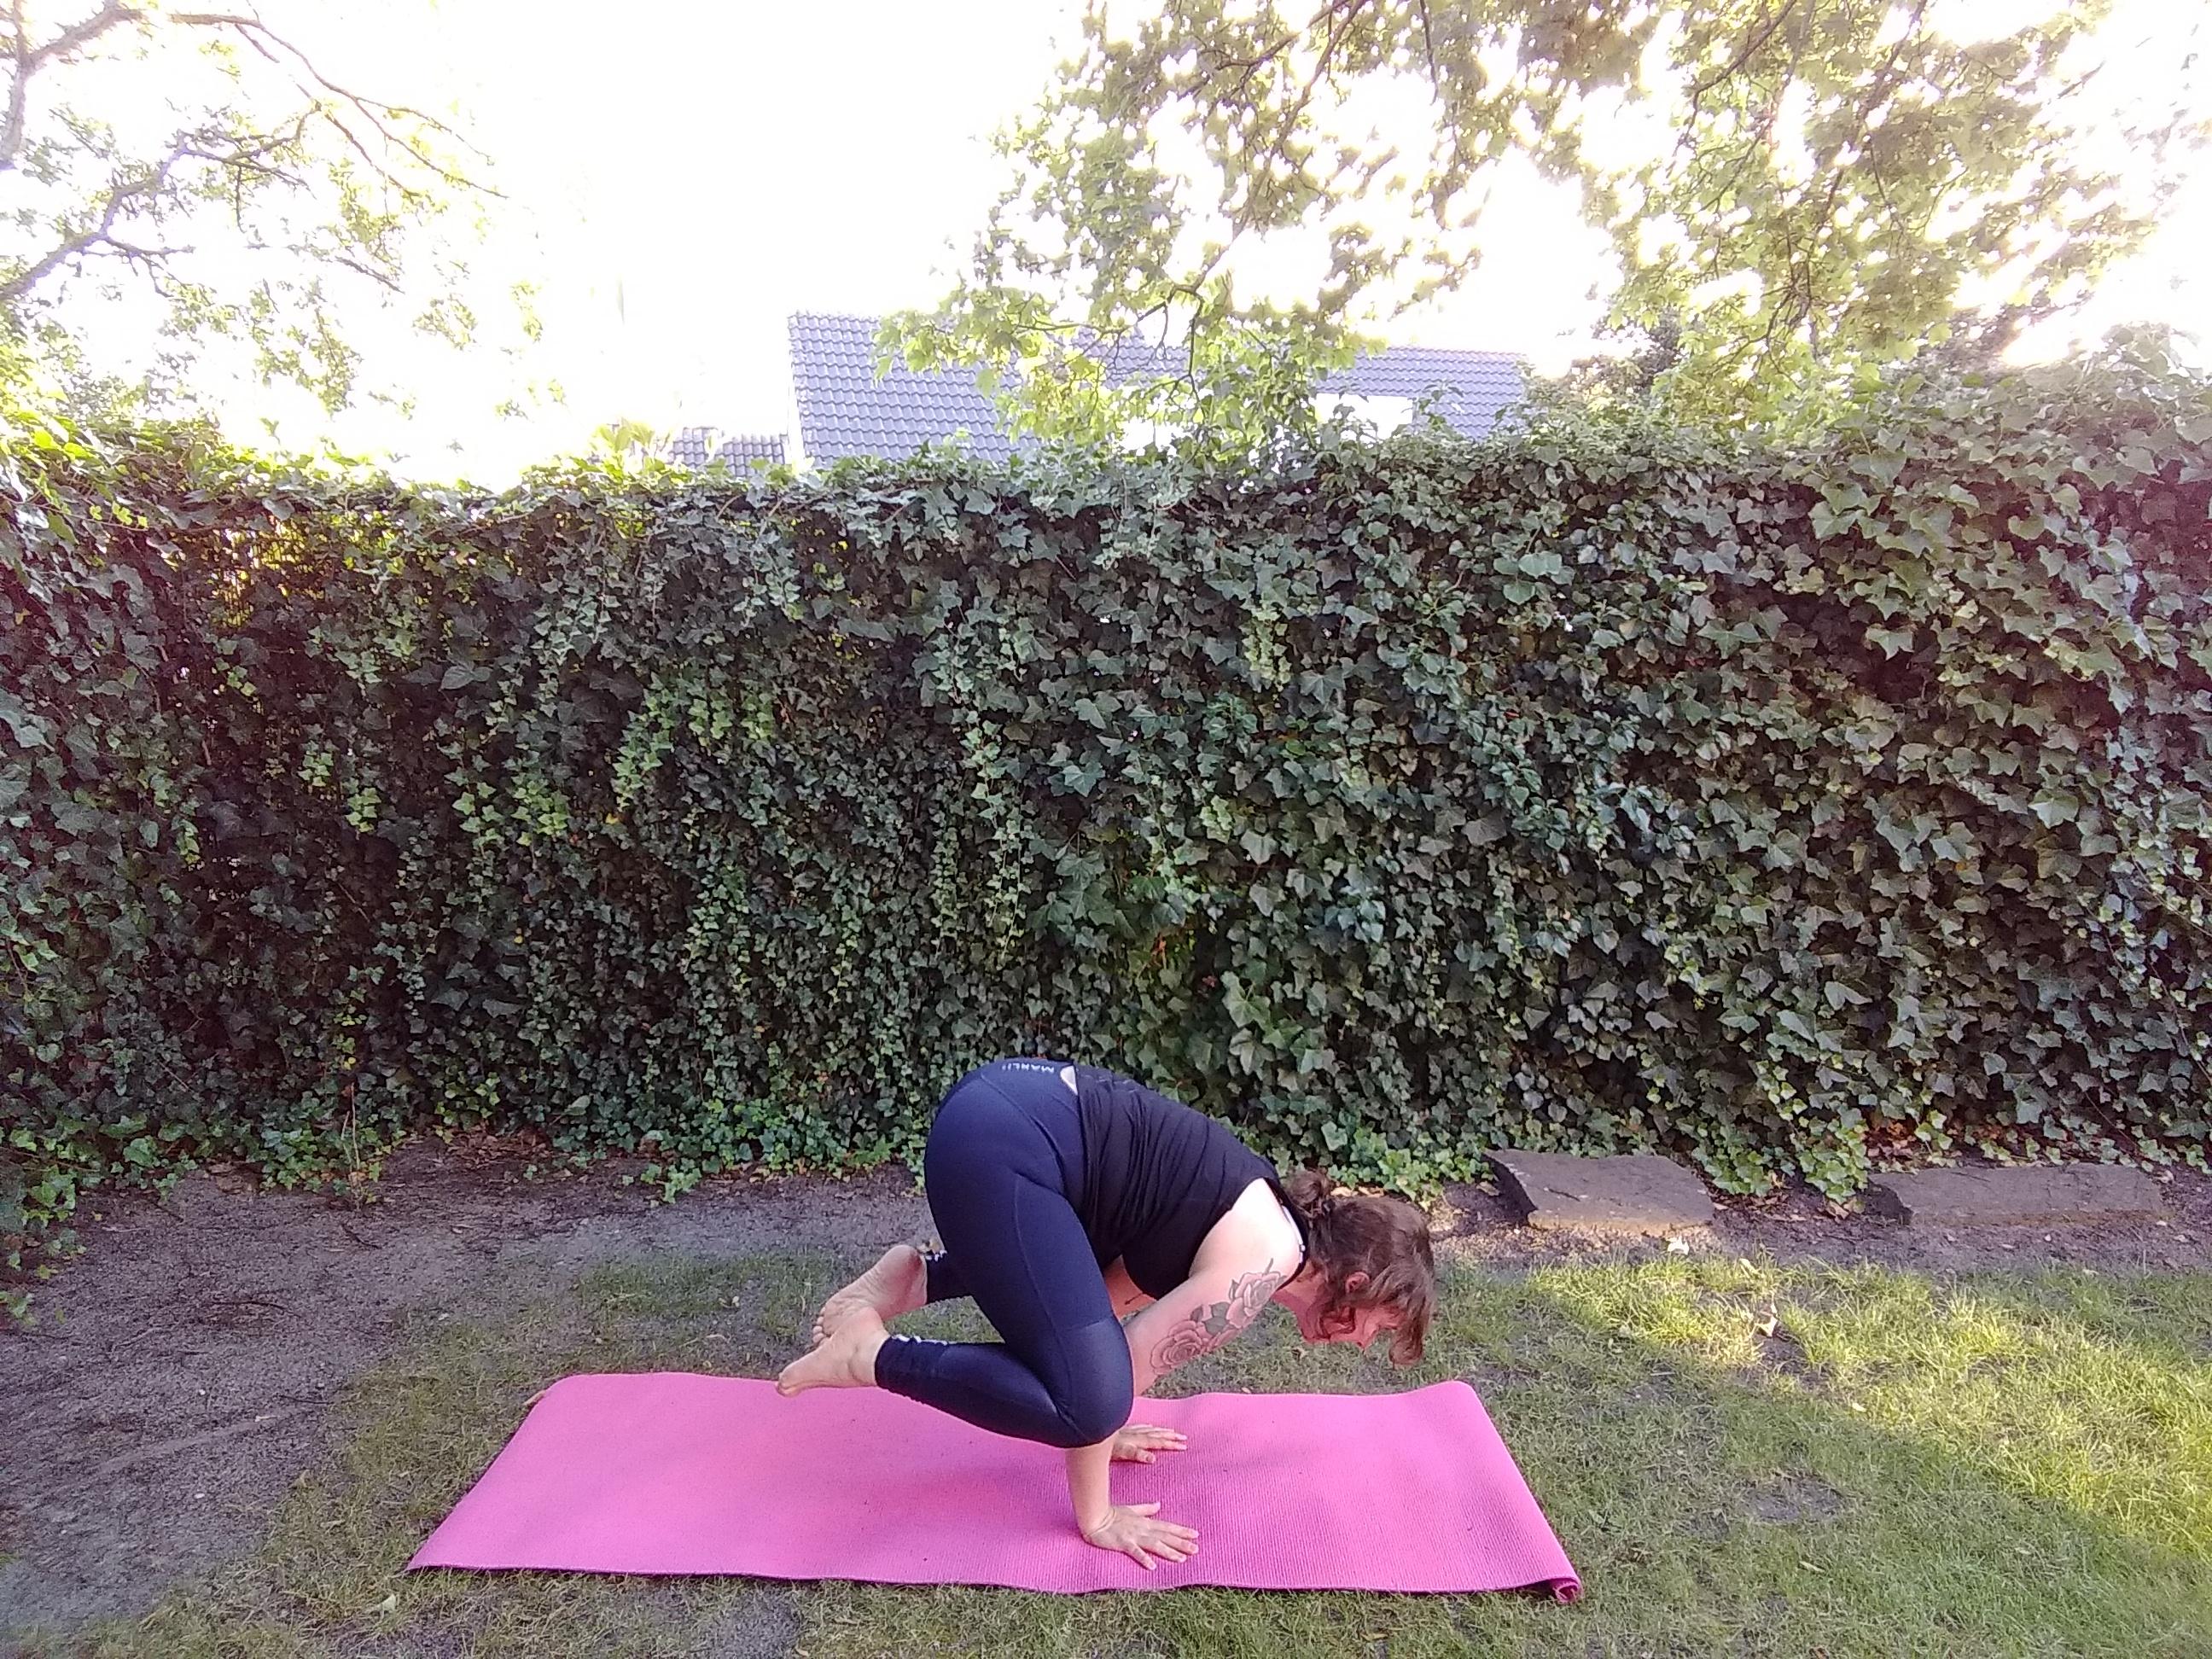 yogajourney, yoga, yogamat, mindful, bewust, blessure, rugblessure, balans, herstel, lifestyle, health, persoonlijke groei, gezondheid, mamablog, lalog.nl